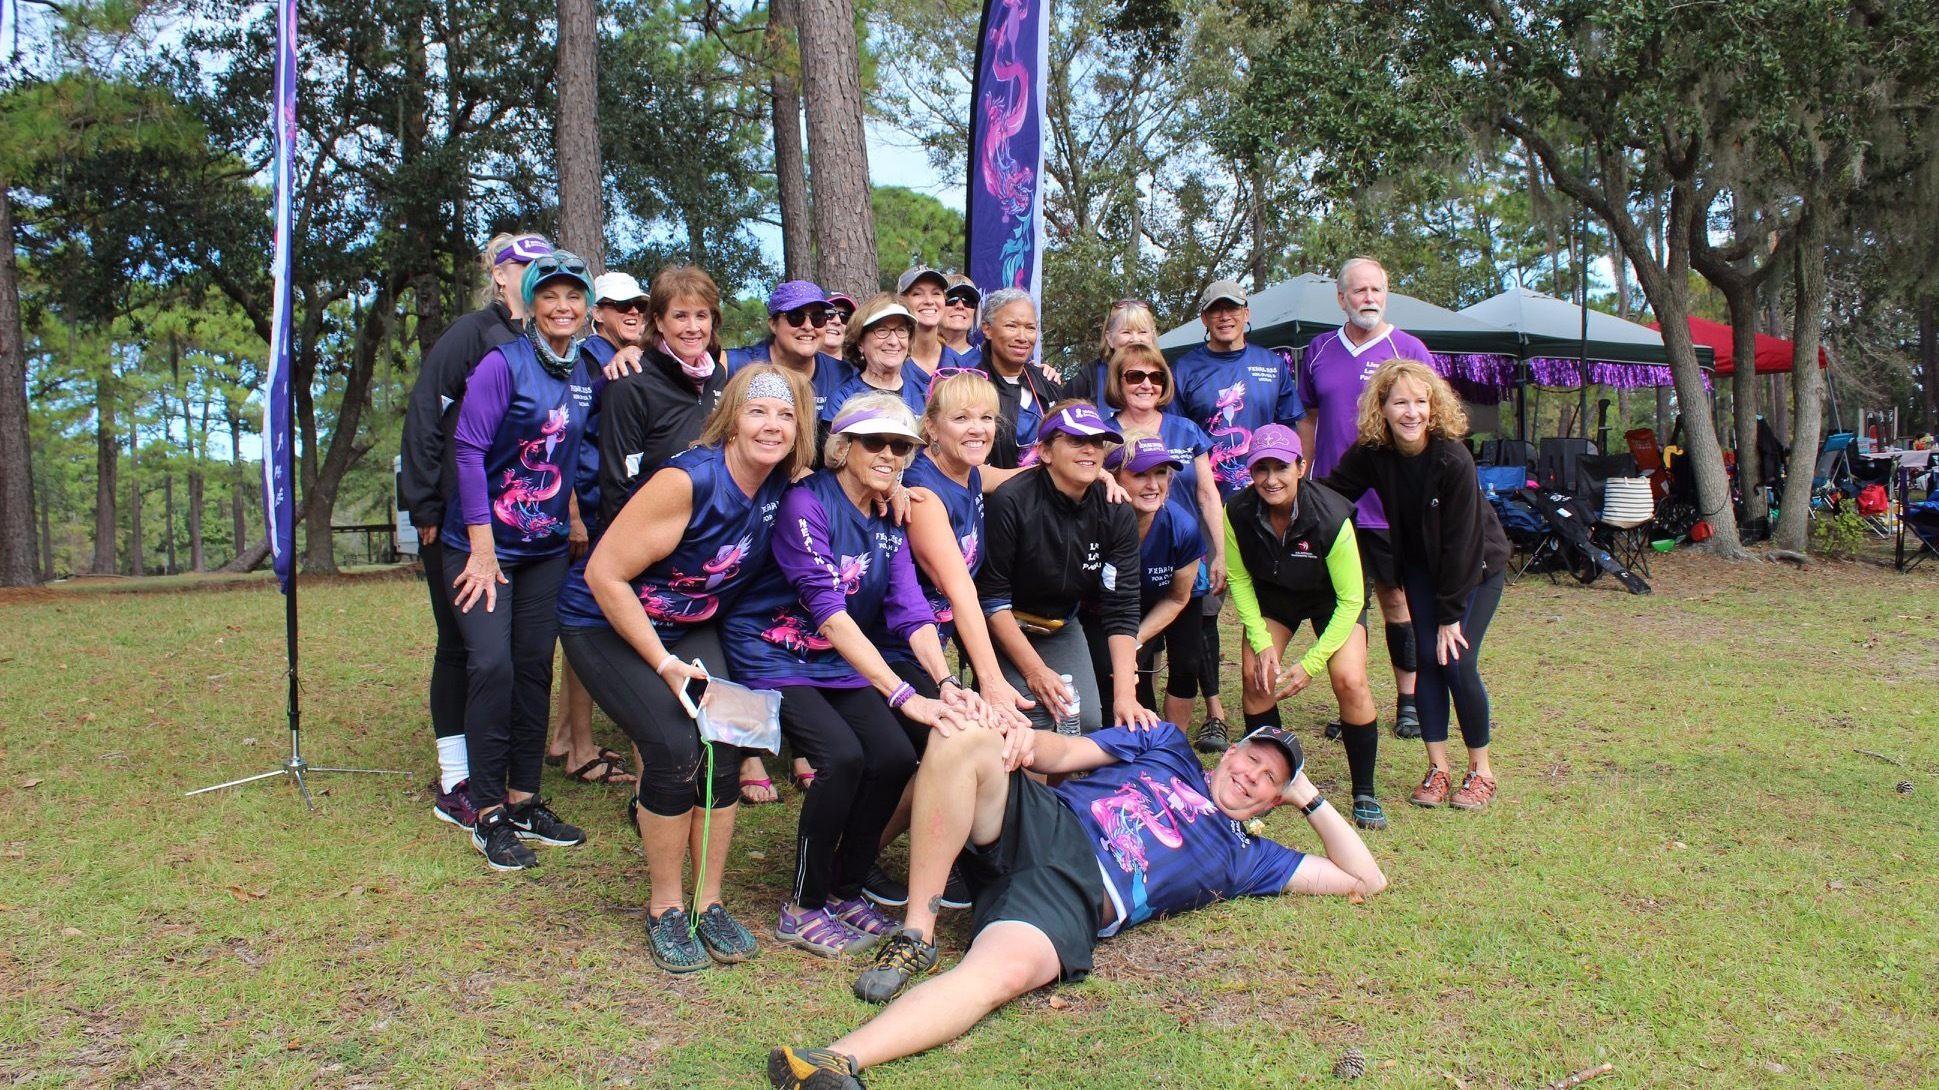 Healing Dragons Dragon Boat Team   Charlotte,NC